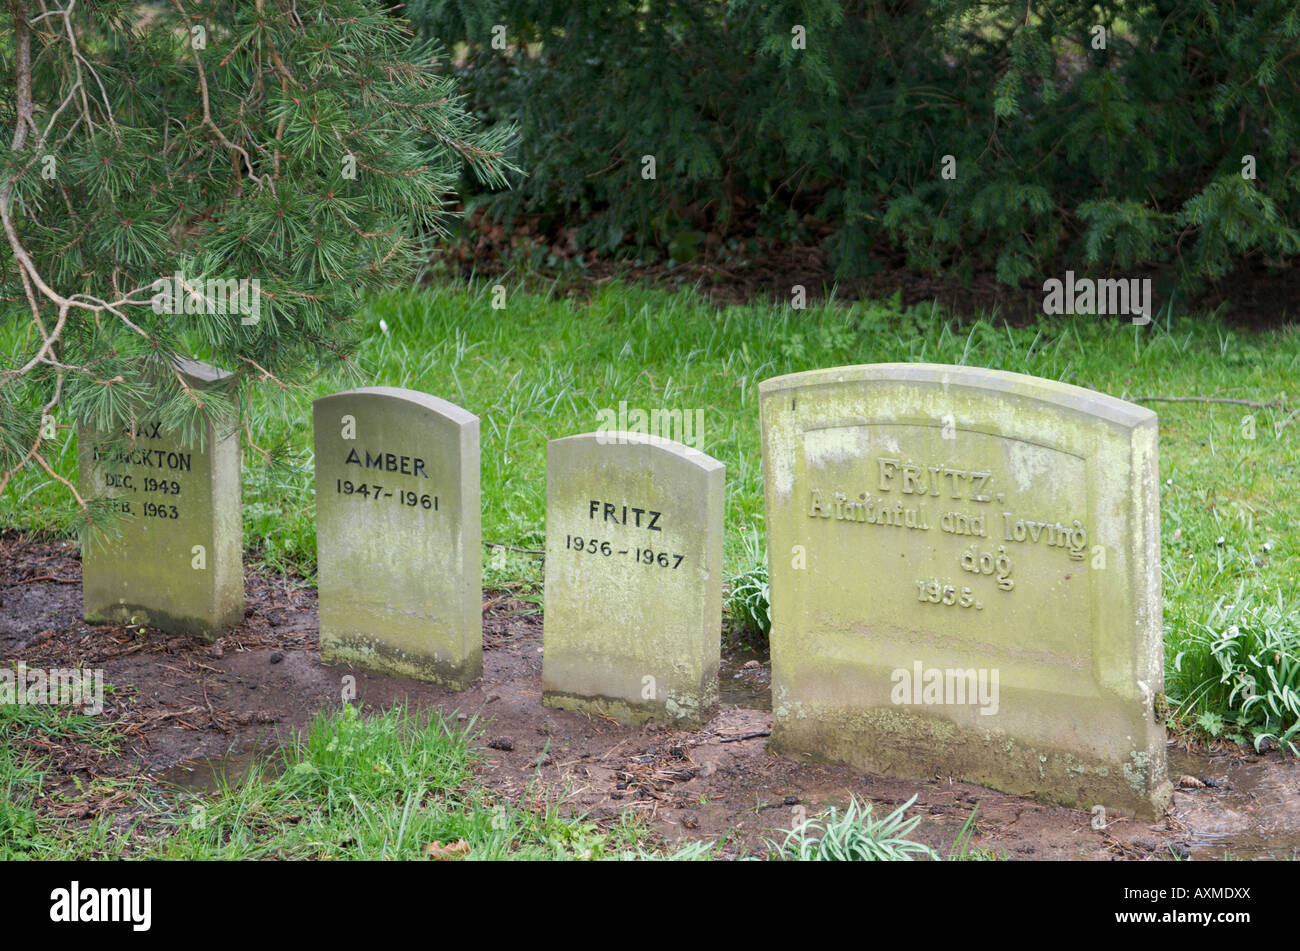 http://c7.alamy.com/comp/AXMDXX/pet-cemetery-at-madresfield-court-worcestershire-AXMDXX.jpg